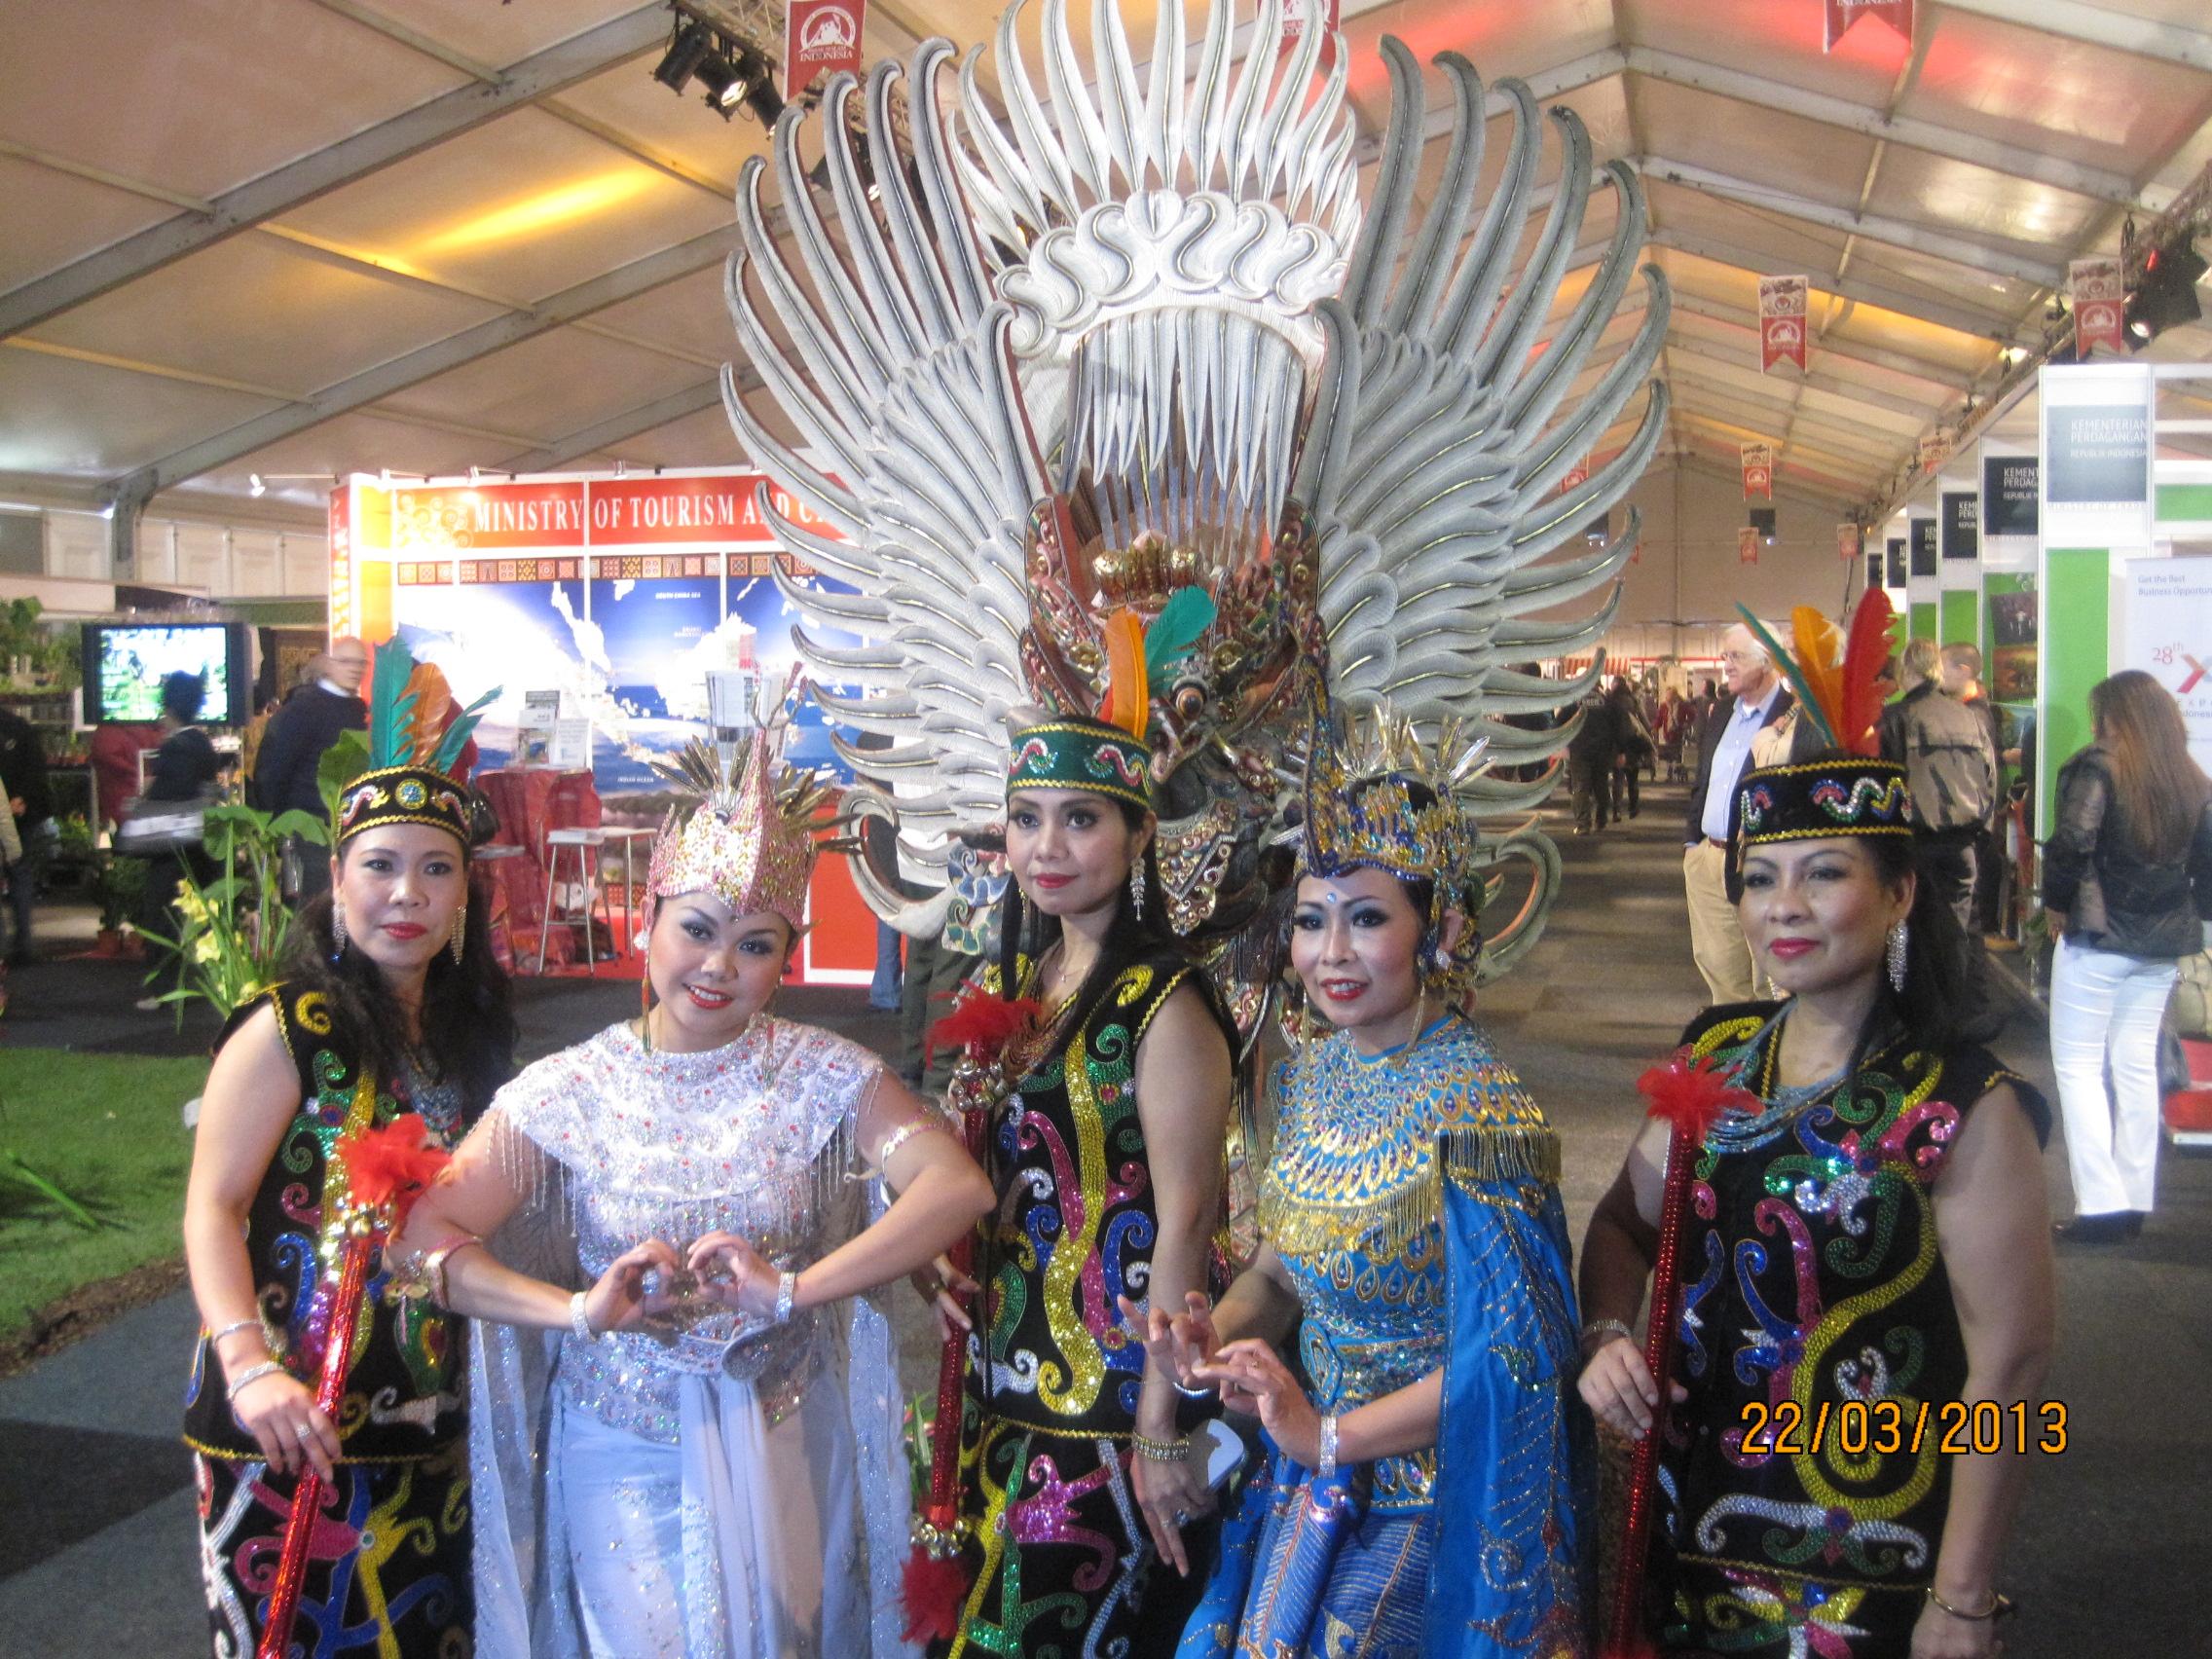 Terugblik op de Pasar Malam Indonesia 2013